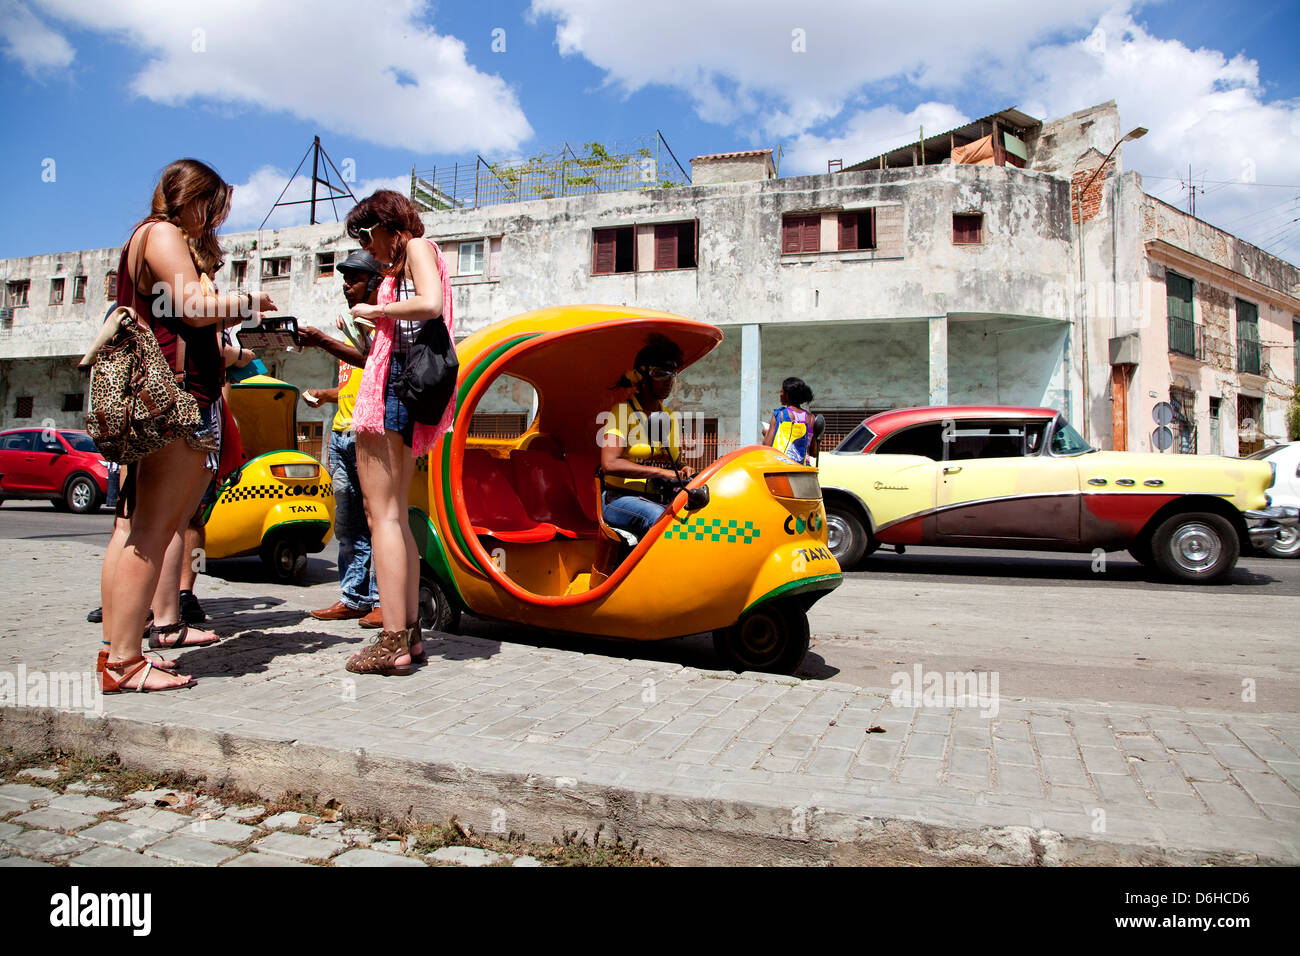 Taxi and tourists, Cuban city of Havana, La Habana, Cuba, South America, Latin America - Stock Image